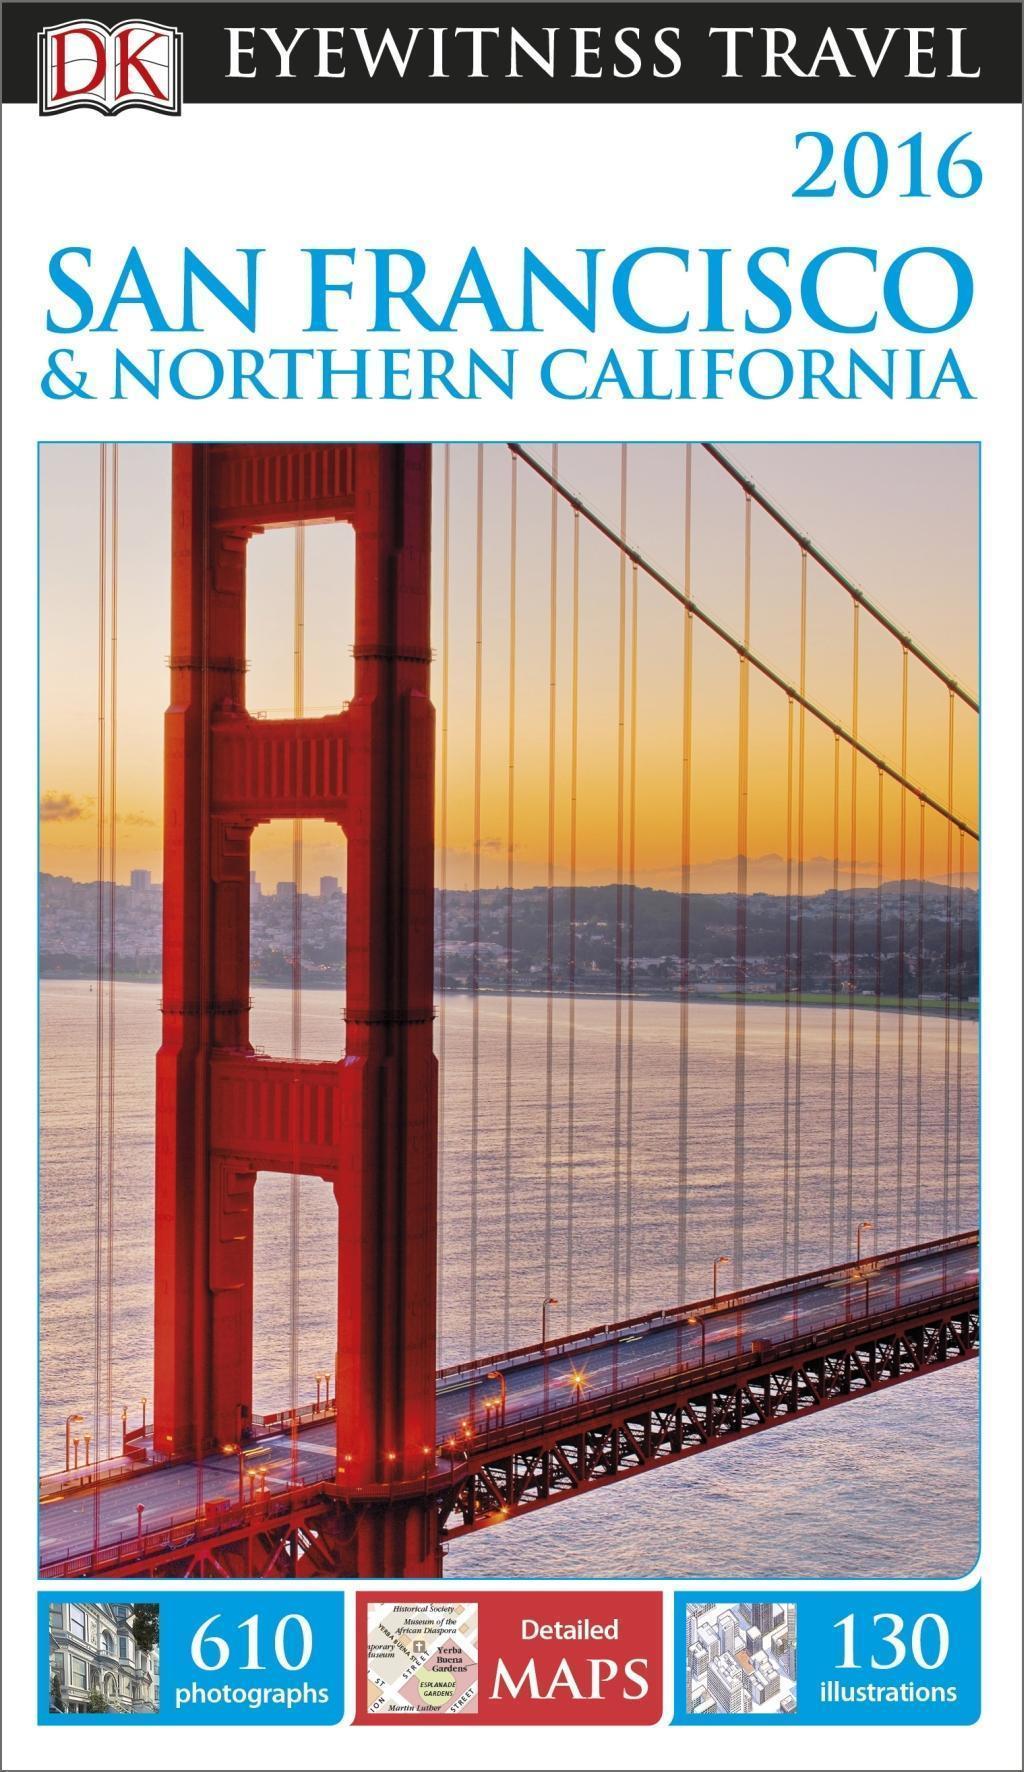 DK Eyewitness Travel Guide San Francisco & Northern California